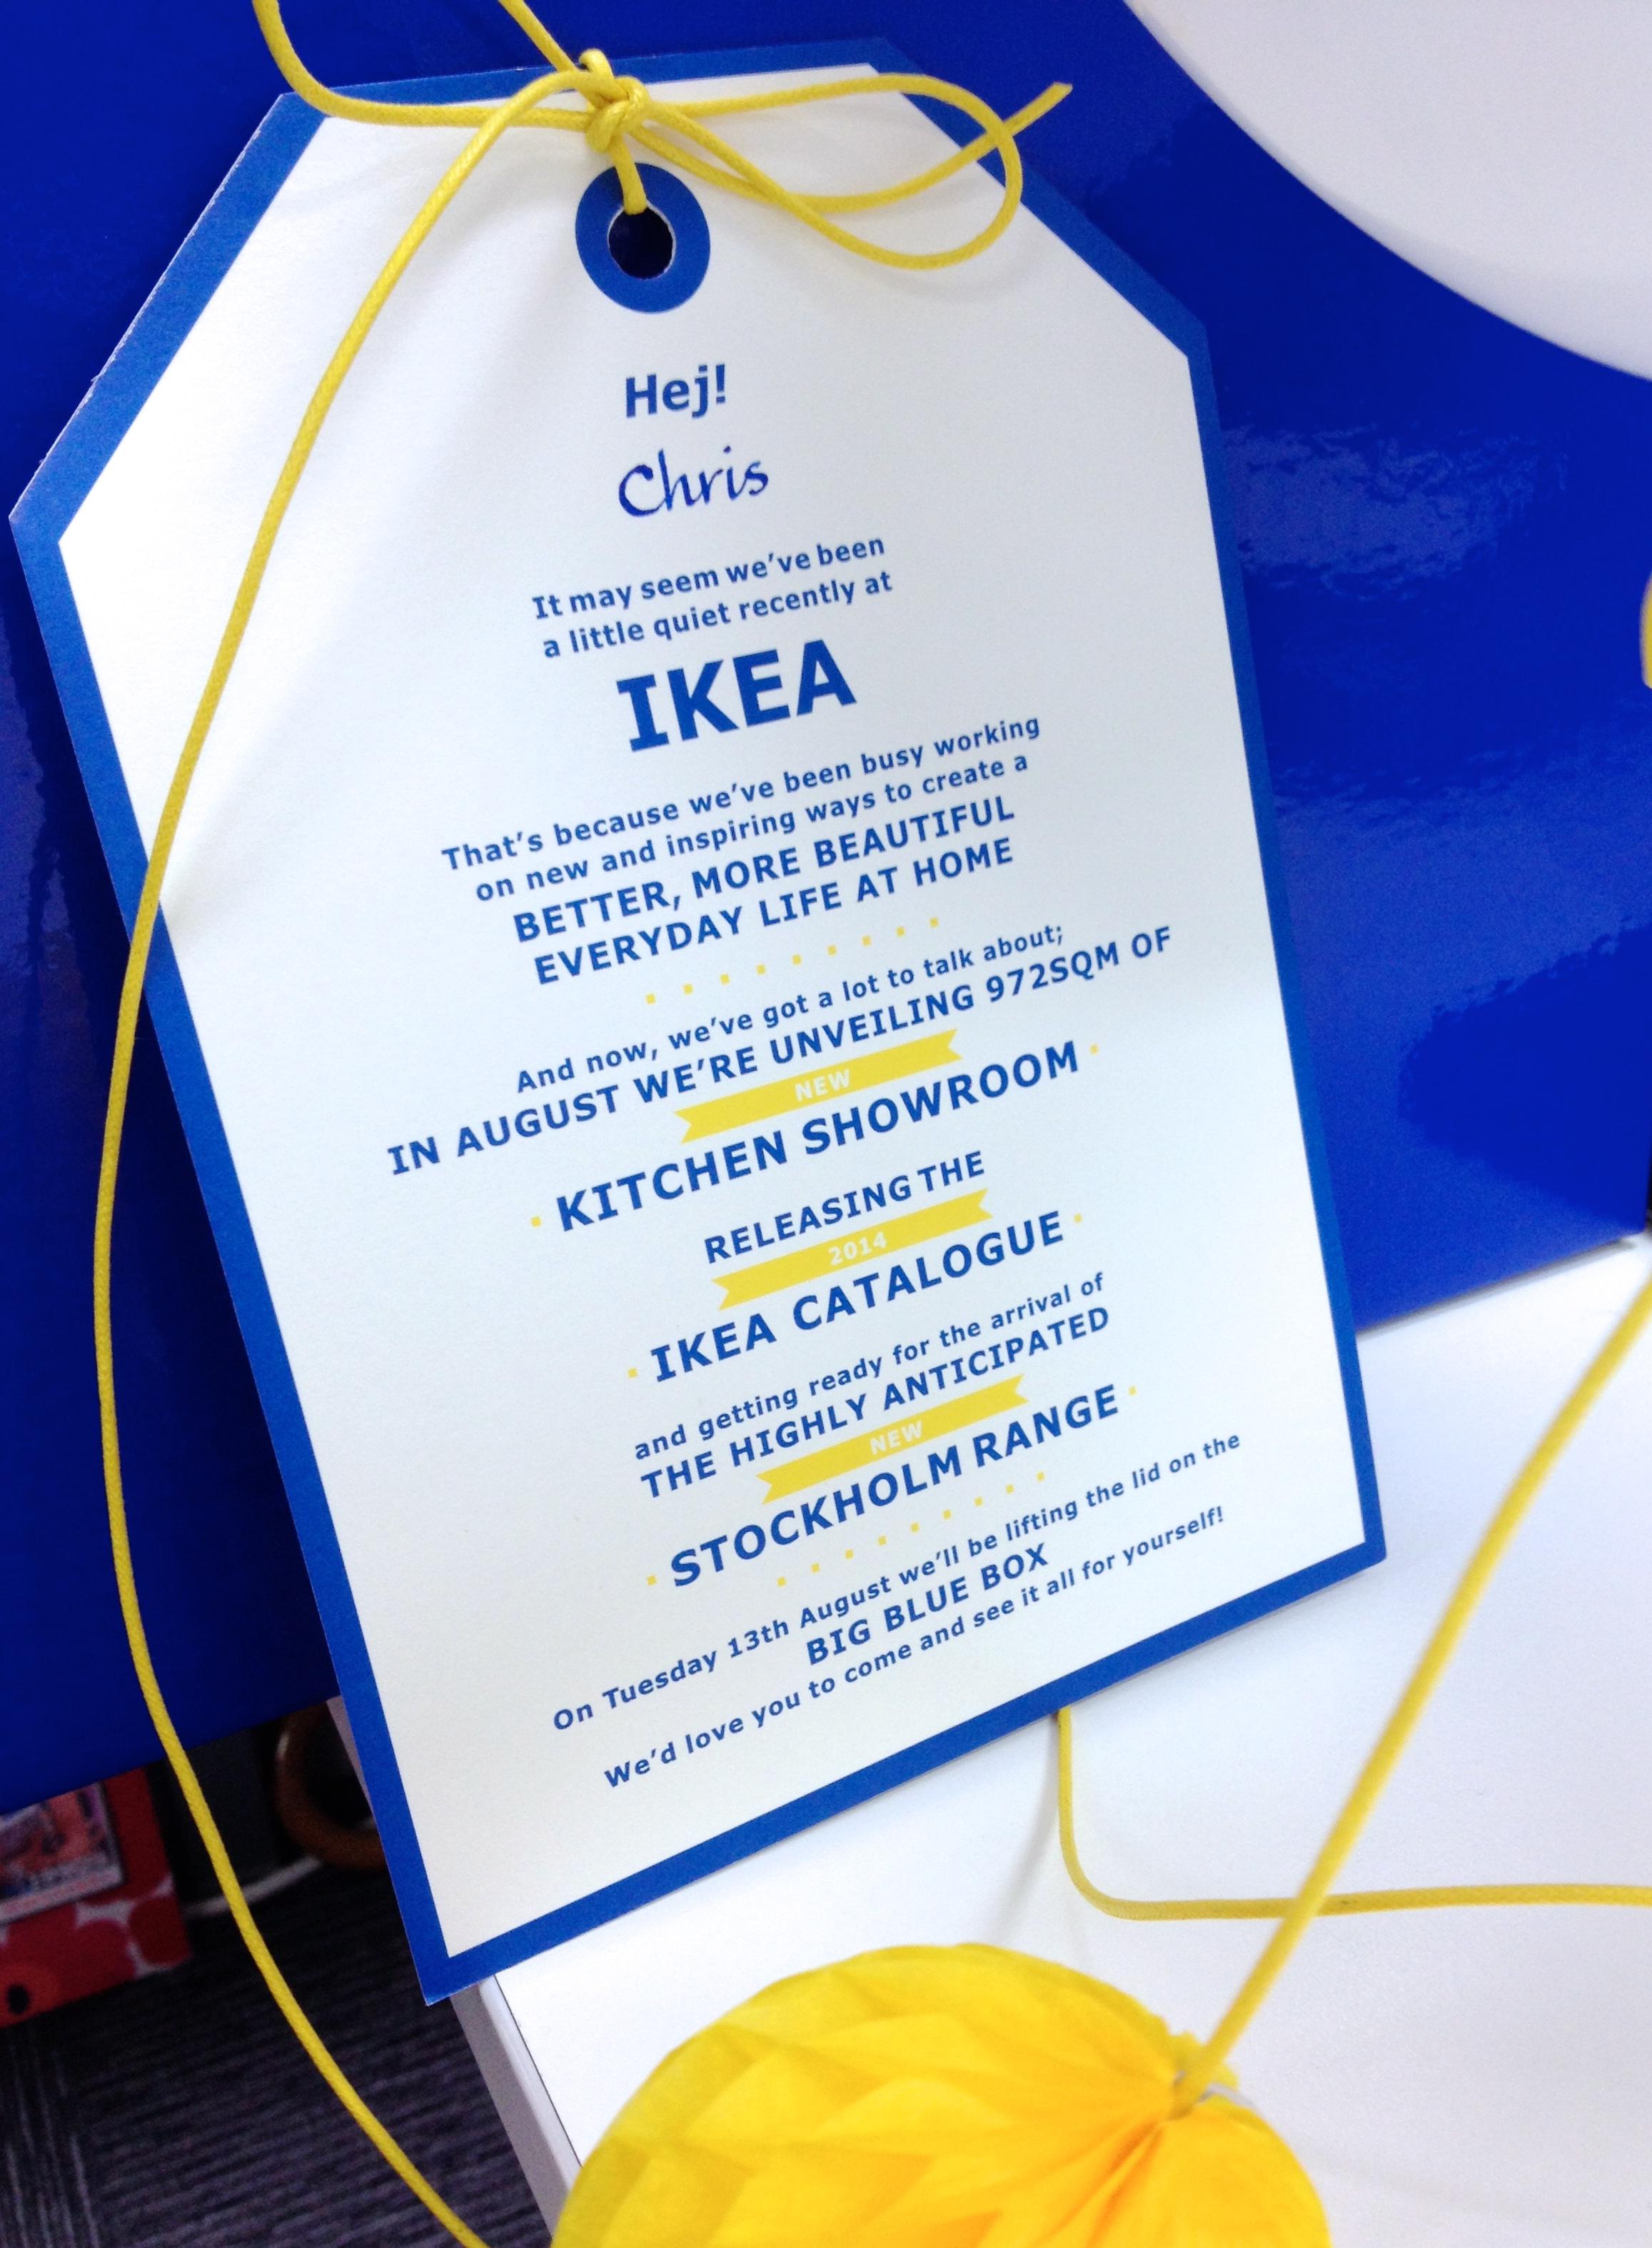 IKEA Invitation - The Big Blue Box